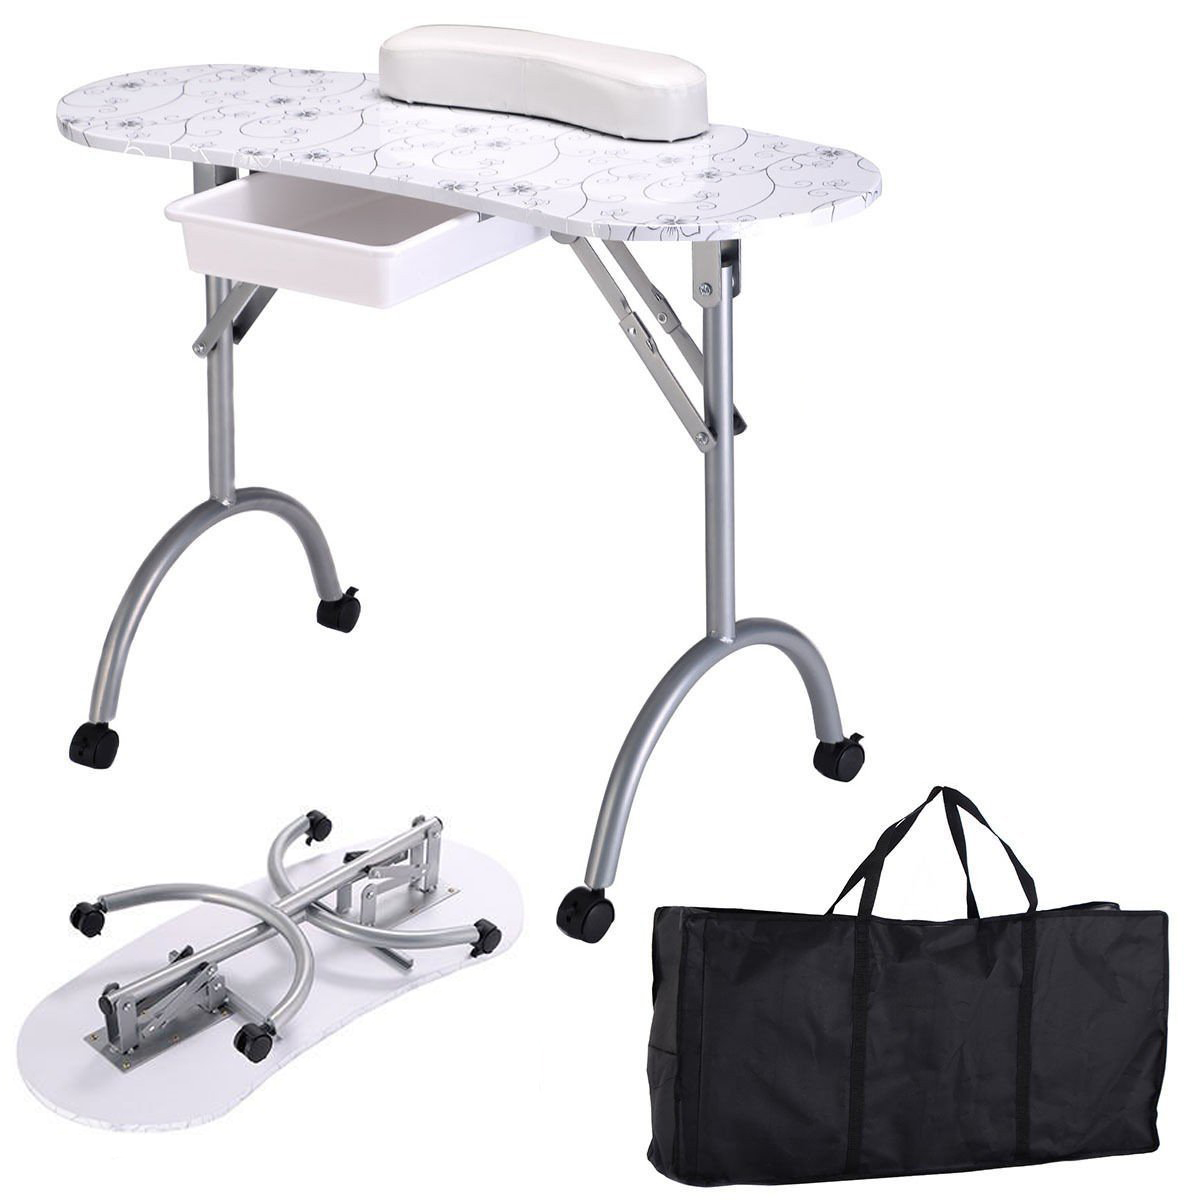 Fashion Pattern Removable Portable Folding Nail Table With Bag Stable & Durable Nail Tables With Movable Wheel Drawer MT-017F